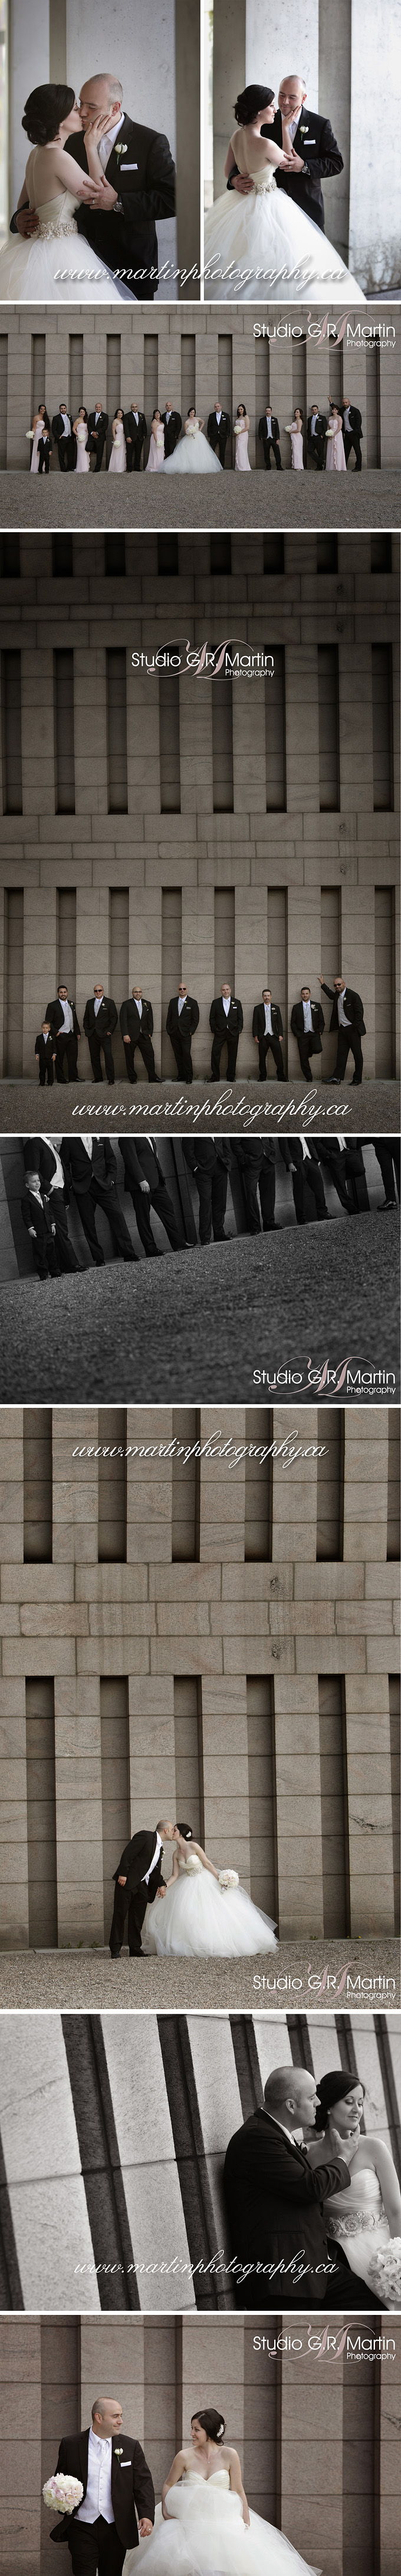 Sala San Marco reception, Italian wedding in Ottawa, Notre-Dame cathedral, Ottawa wedding photographers, lazaro gown, blush wedding, Crab apple Tree, Byward market wedding couple photos, Wedecor